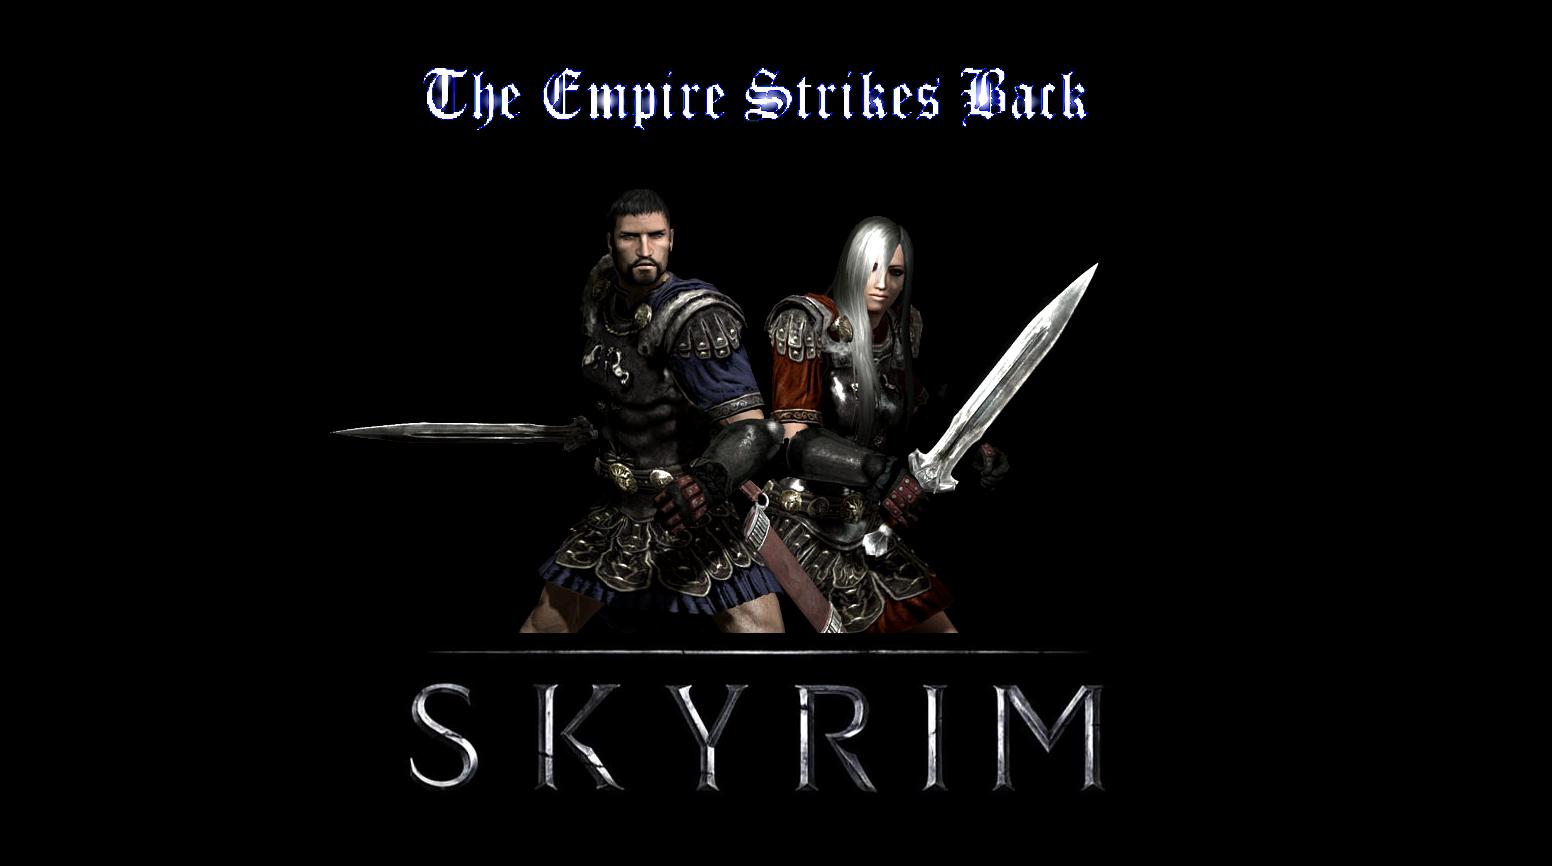 Perfect Legionnaire Imperial Armor Reforged Skyrim Mods Skyrim Nexus